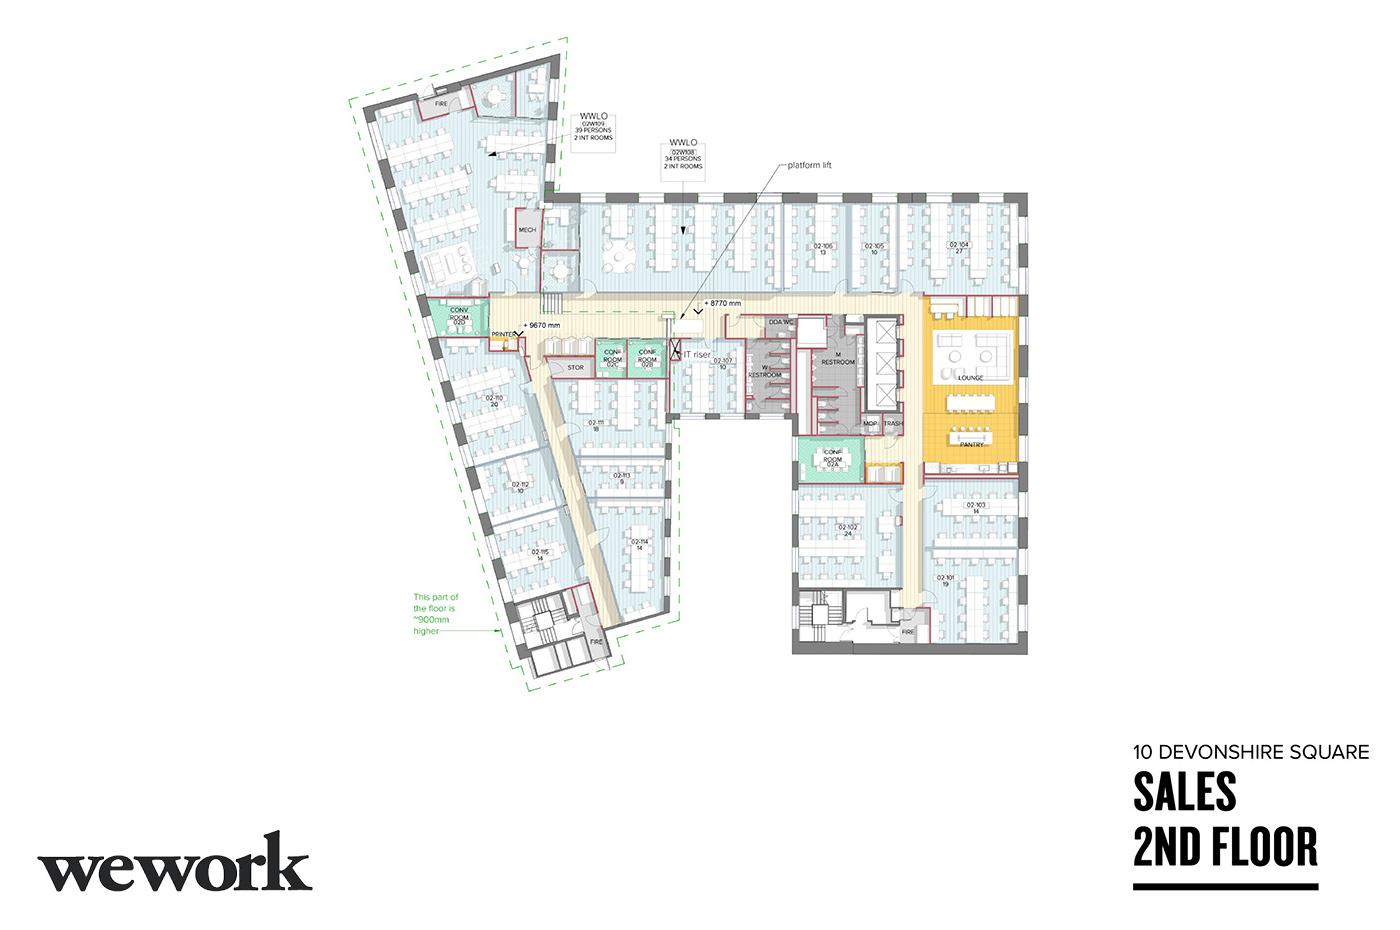 floorplans-14 copy.jpg